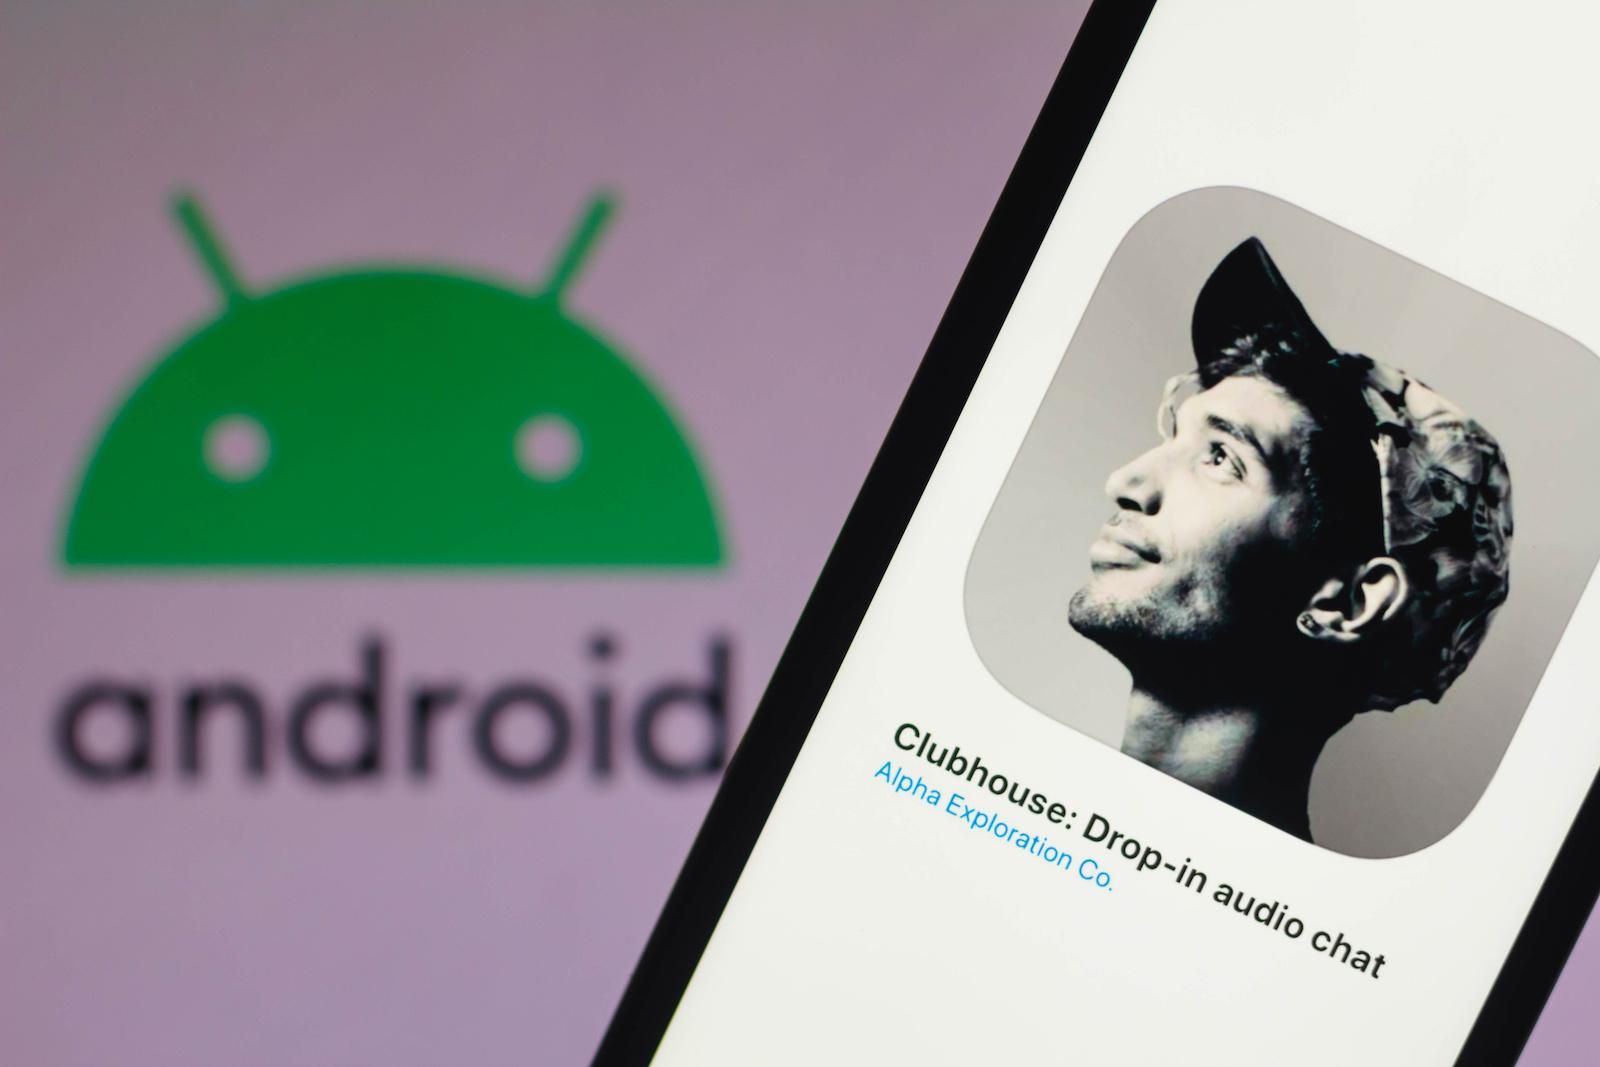 巴西-2021/03/01:在此照片插圖中,看到的會所徽標顯示在智能手機屏幕上,背景中帶有Android徽標。  (照片插圖由Rafael Henrique / SOPA Images / LightRocket via Getty Images)